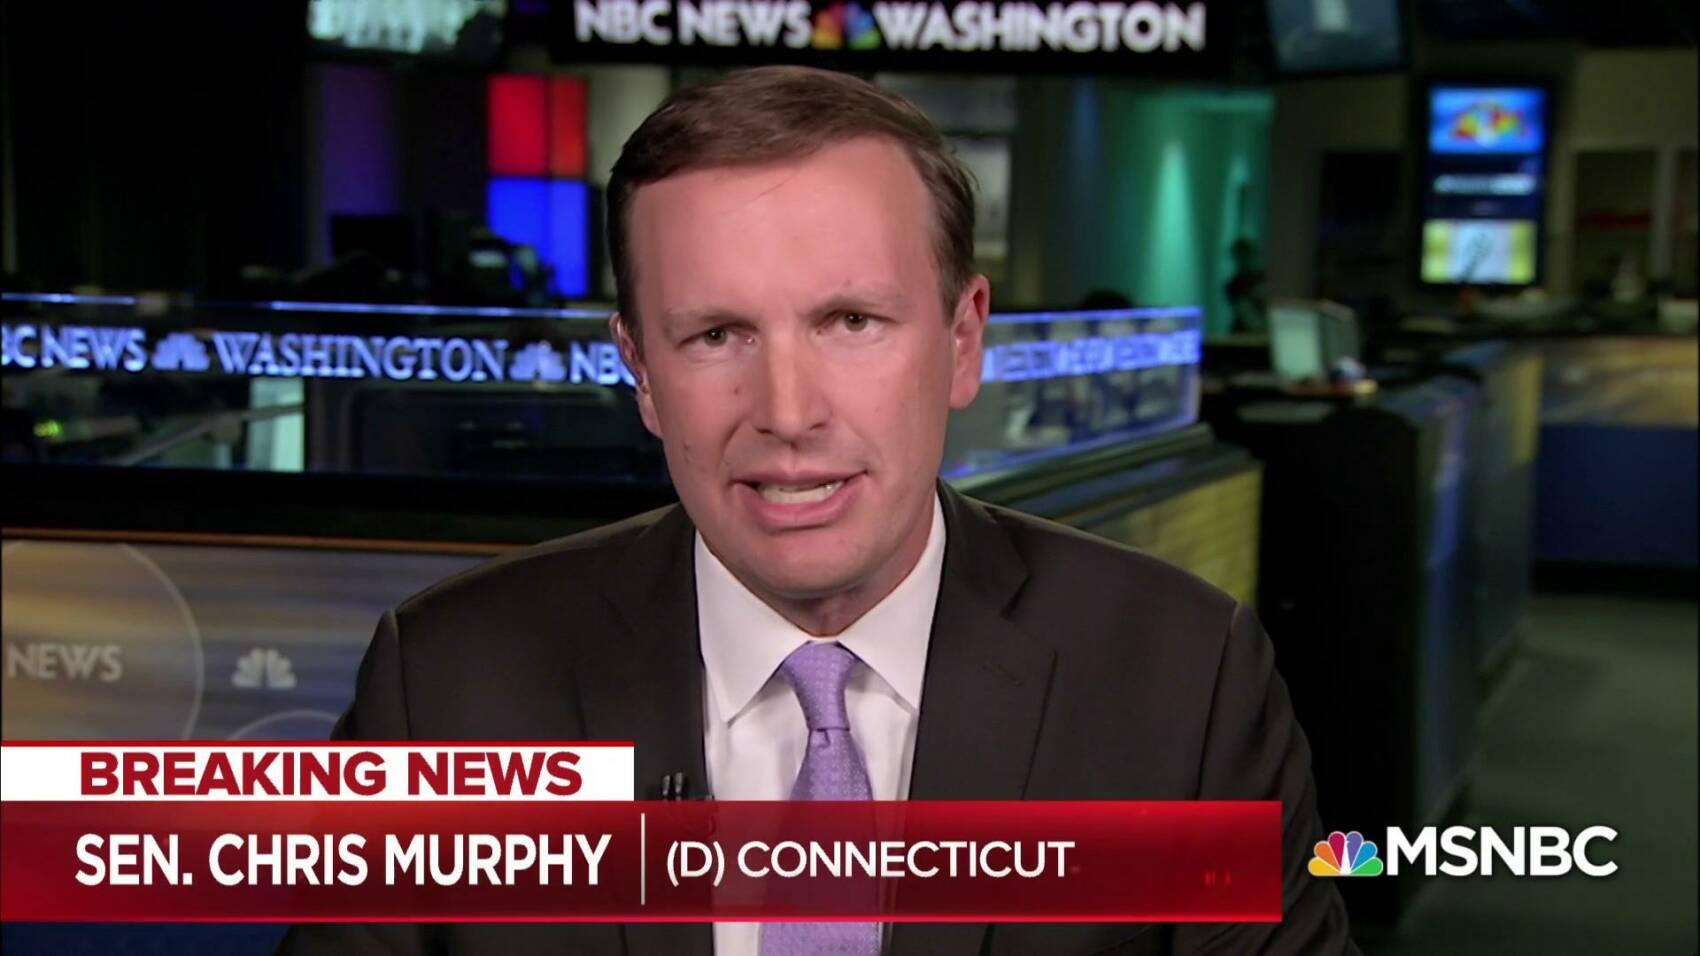 Sen. Murphy: We Probably Should Have Started Evacuation Earlier